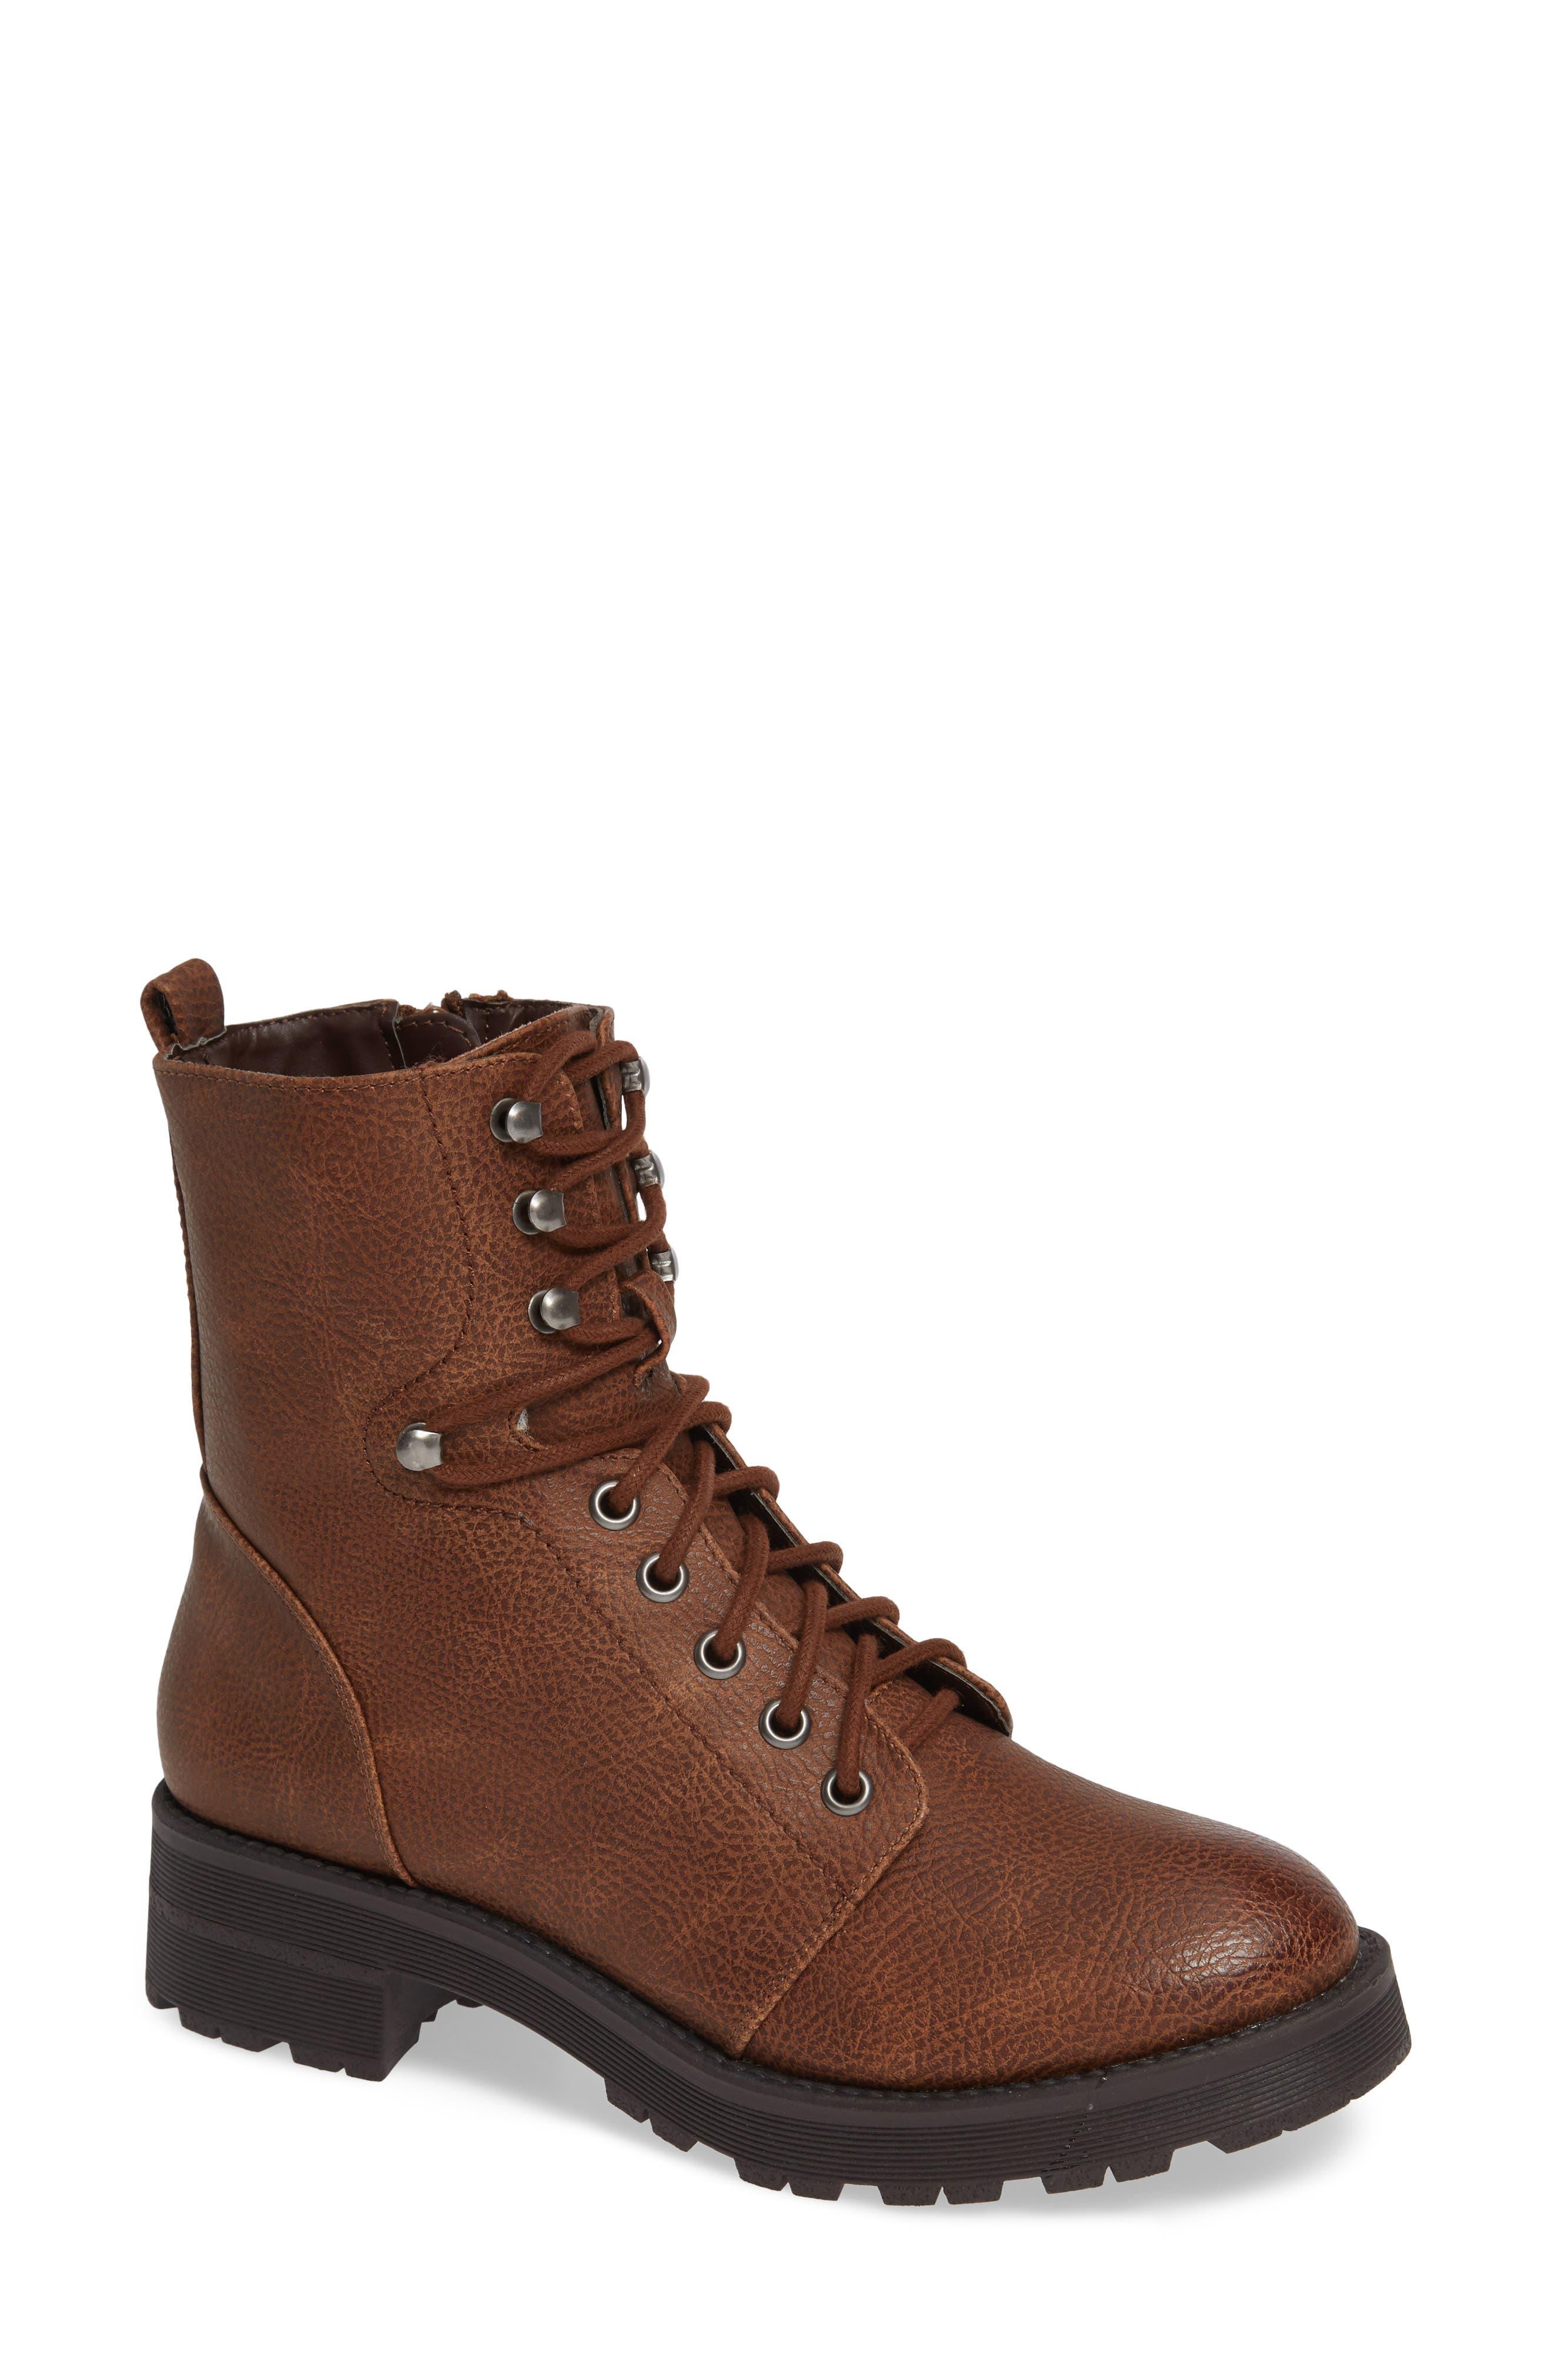 Mia Indigo Boot- Brown